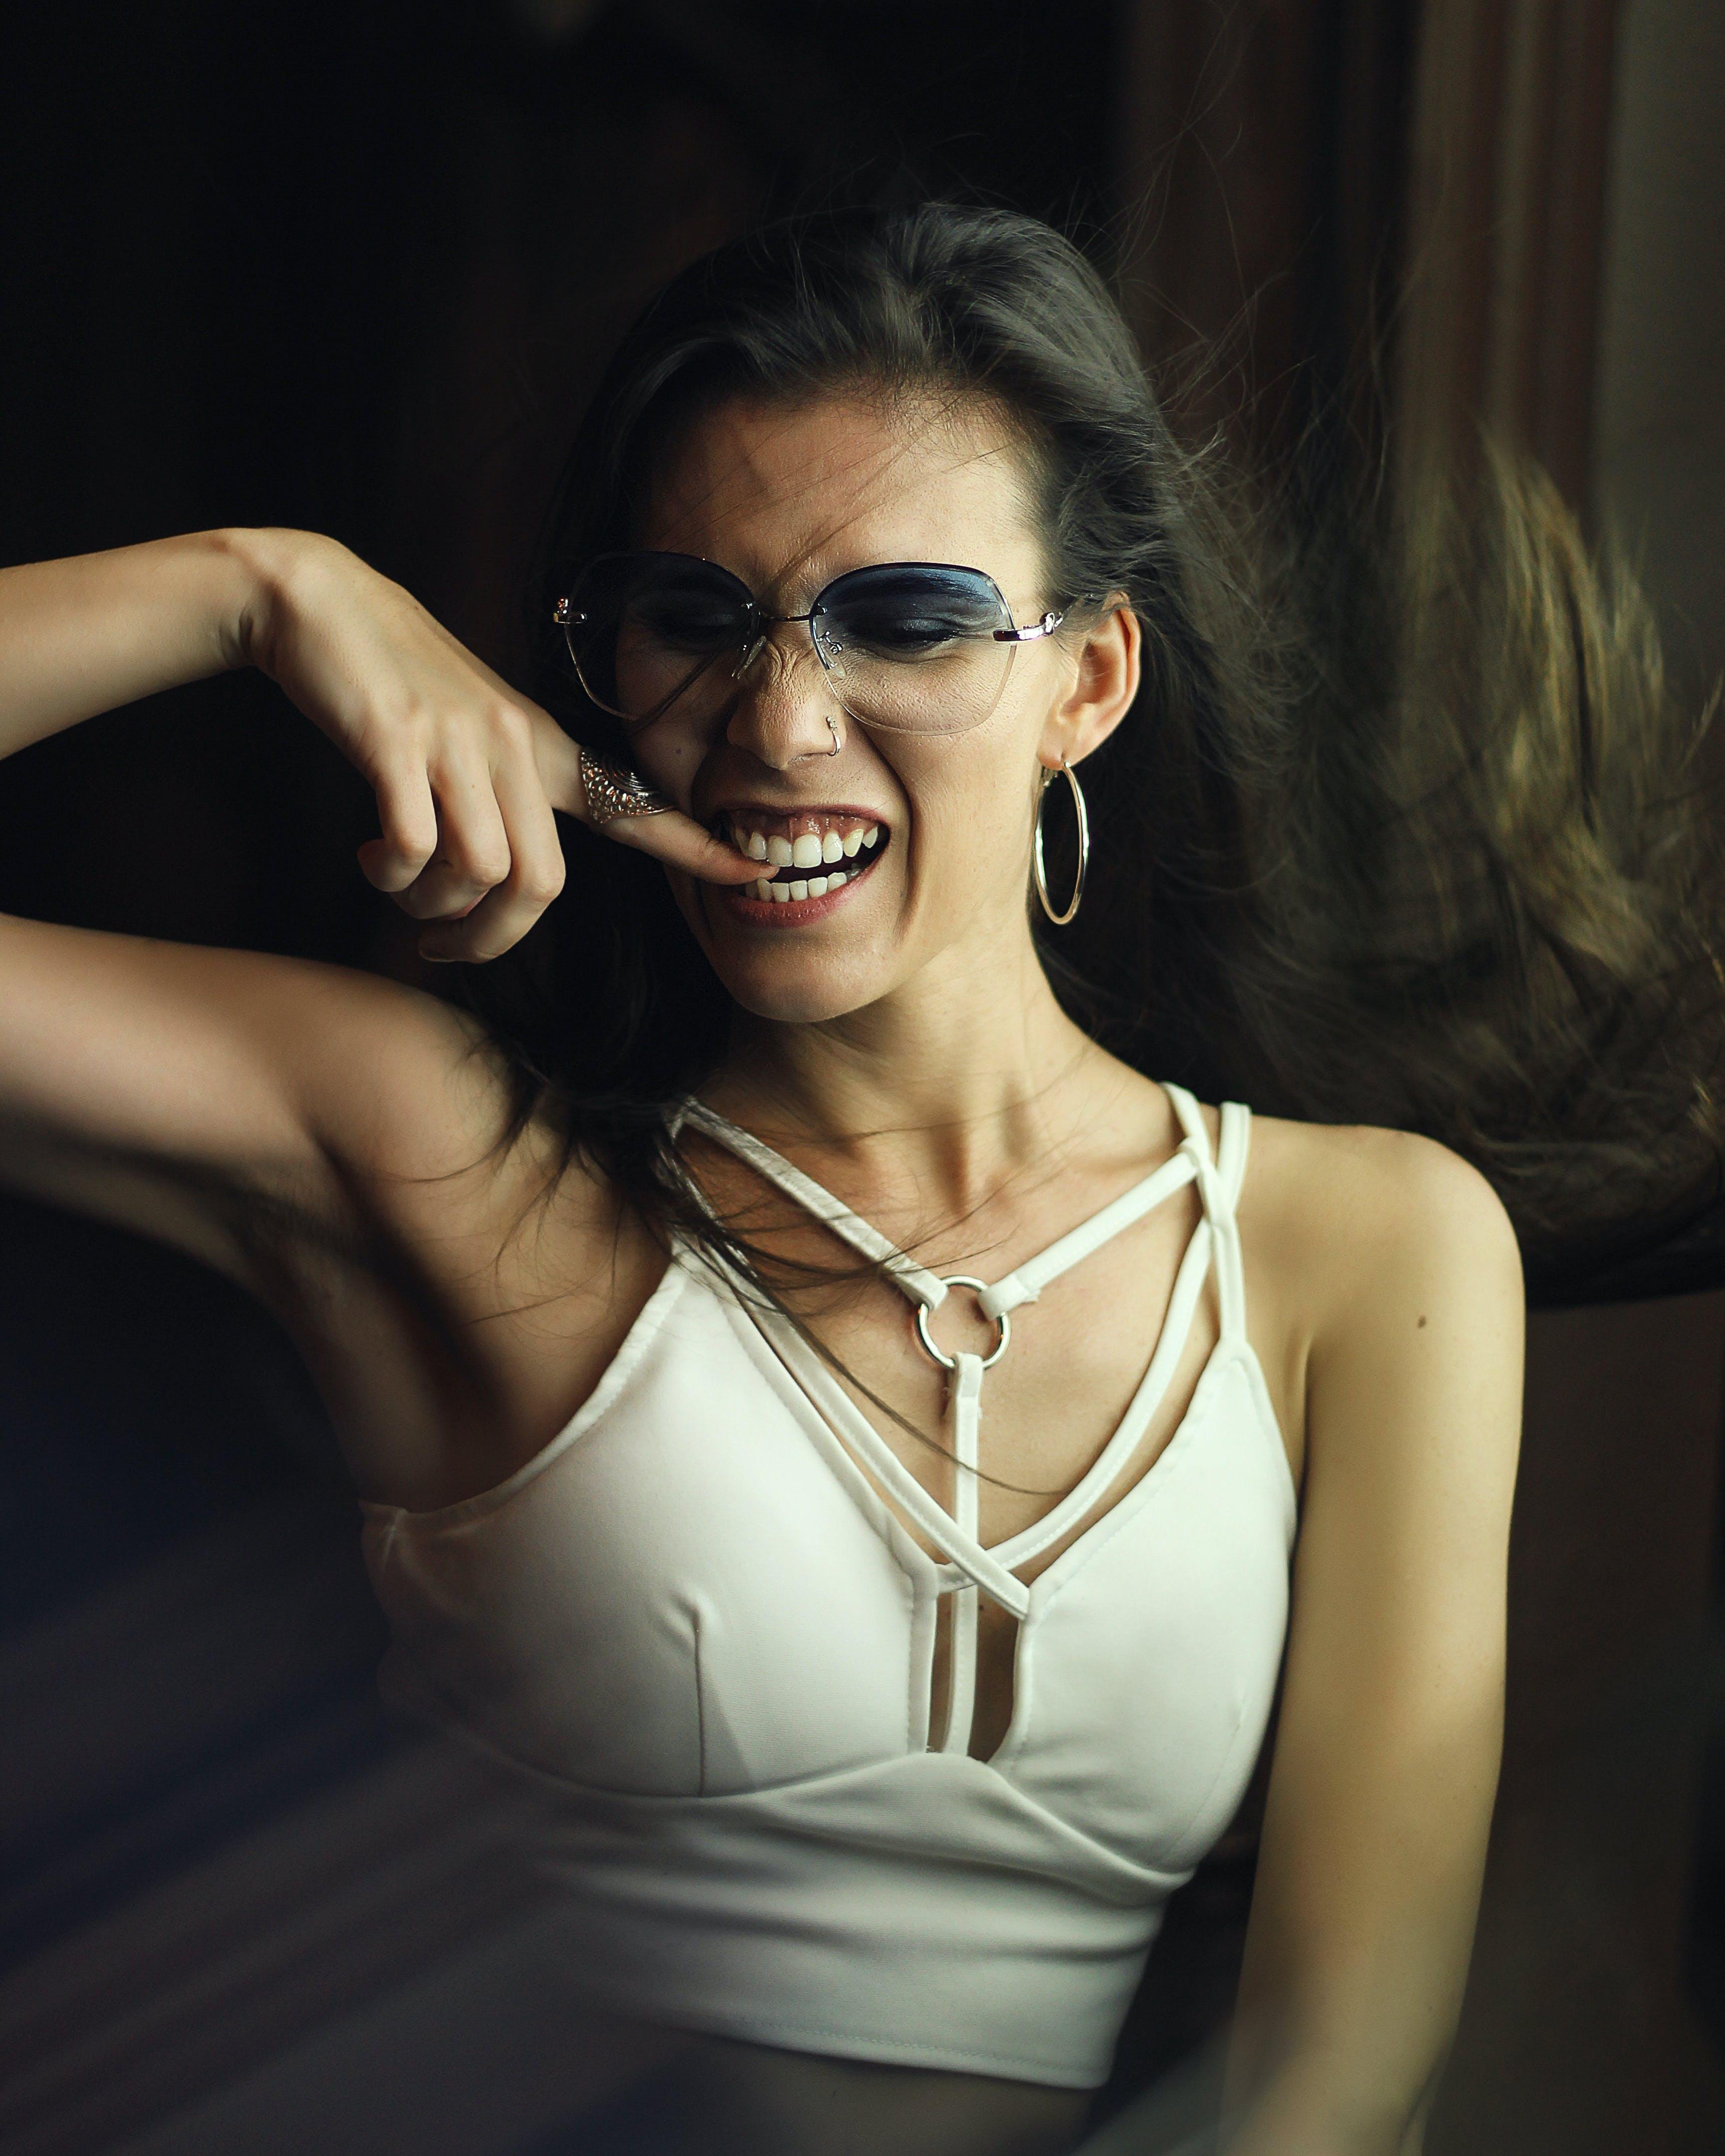 Woman Biting Her Nail